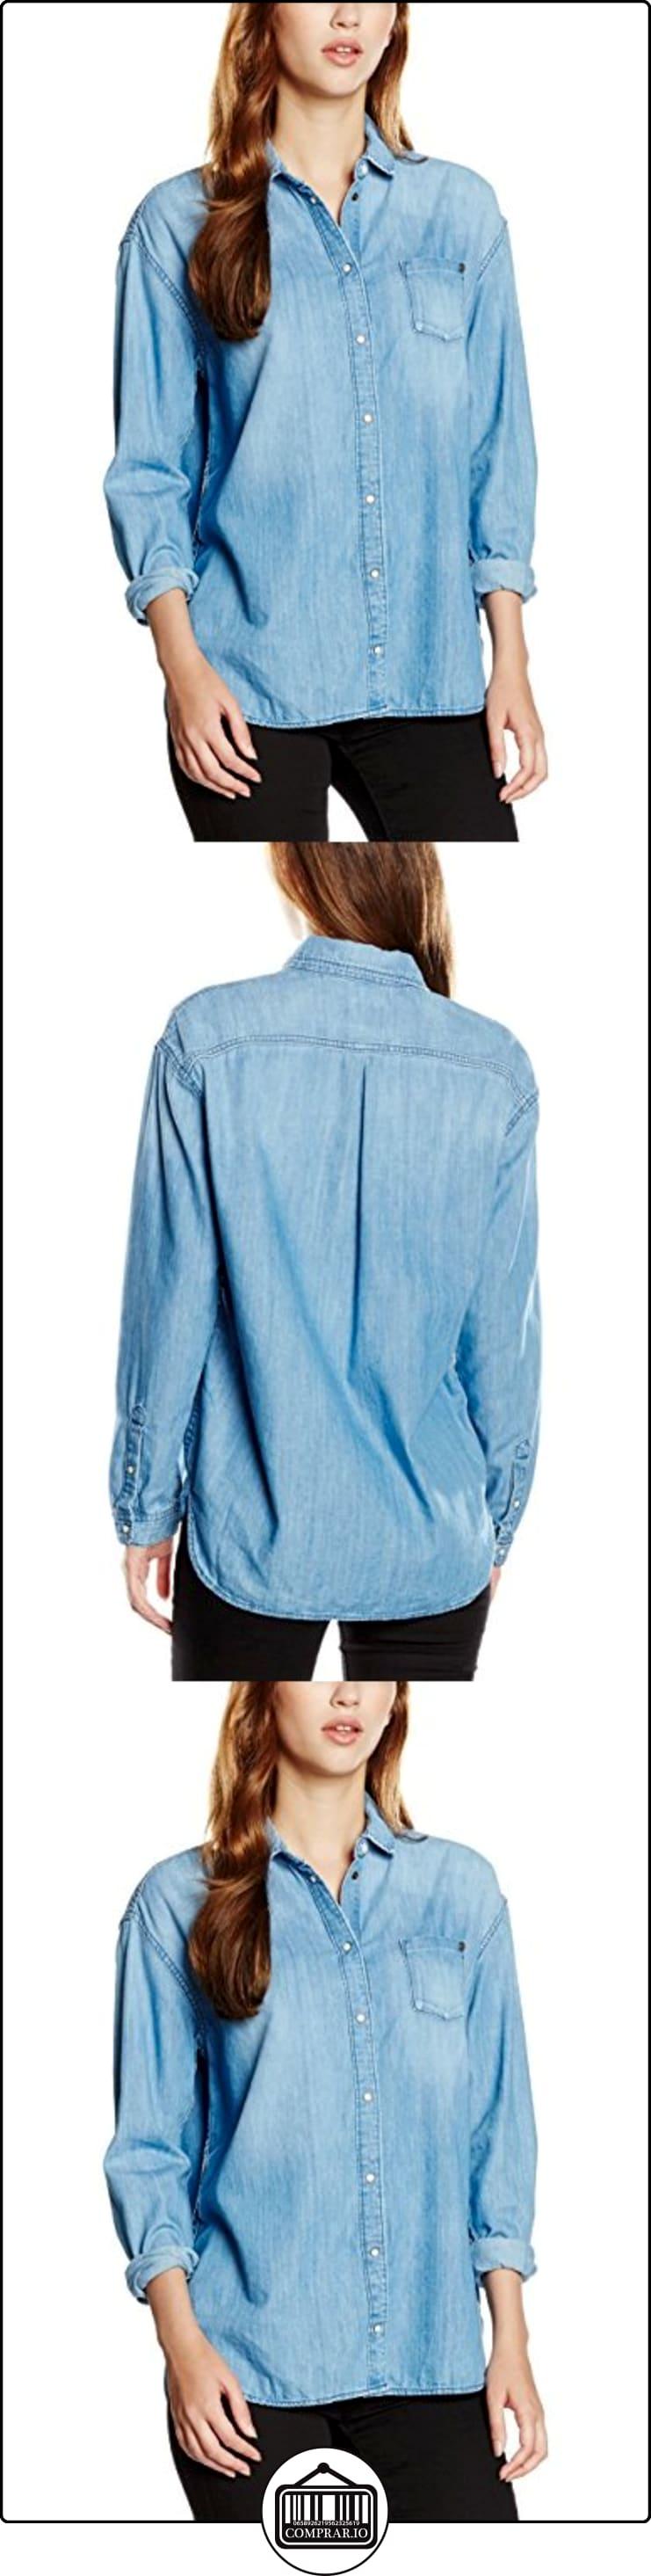 38 Bleu Pepe Del Jeans denim Azul Camisa Mujer talla Mila wq0HS